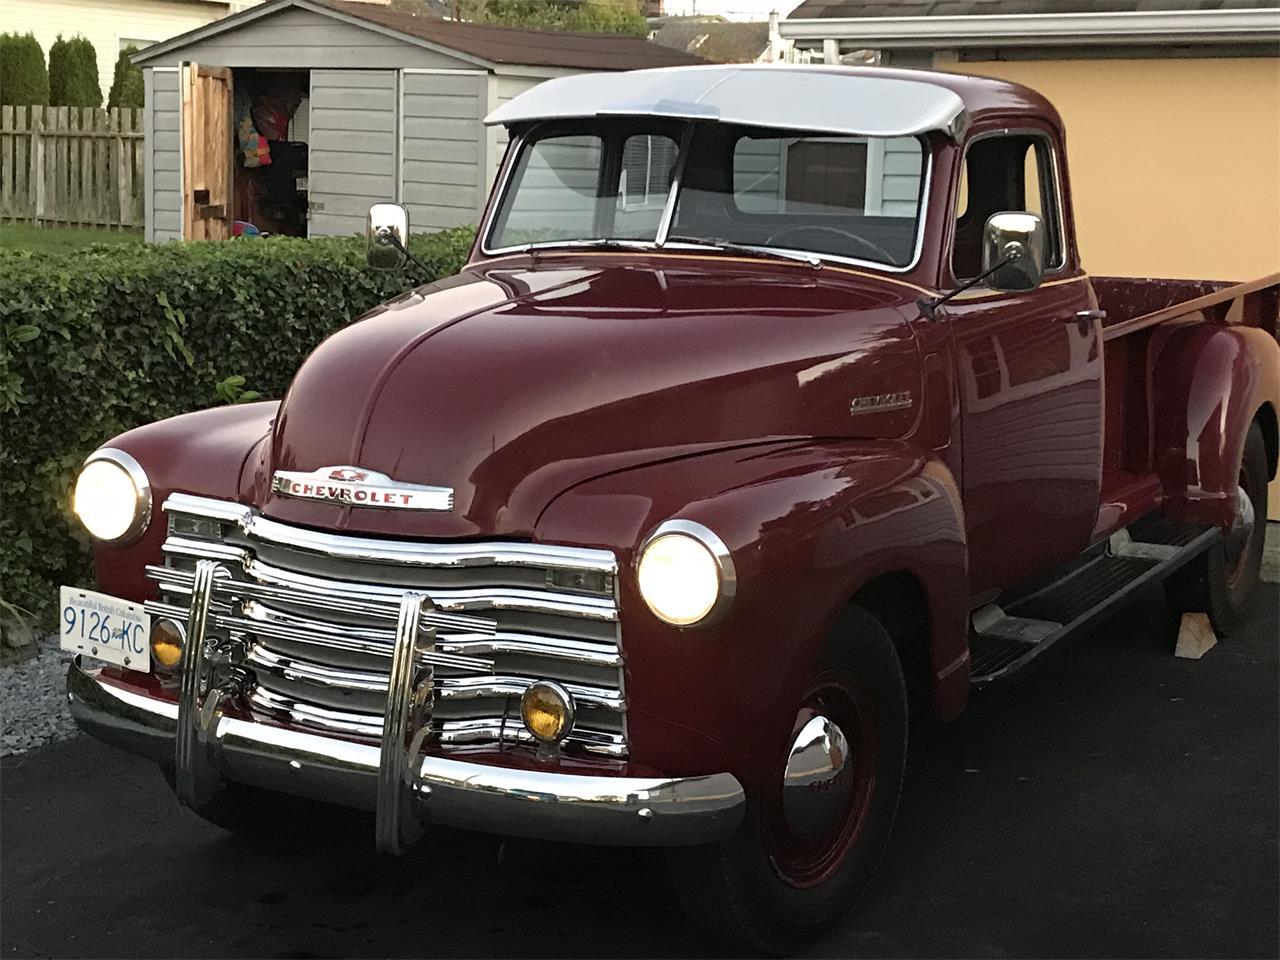 Chevrolet Pickup 1950 prix tout compris